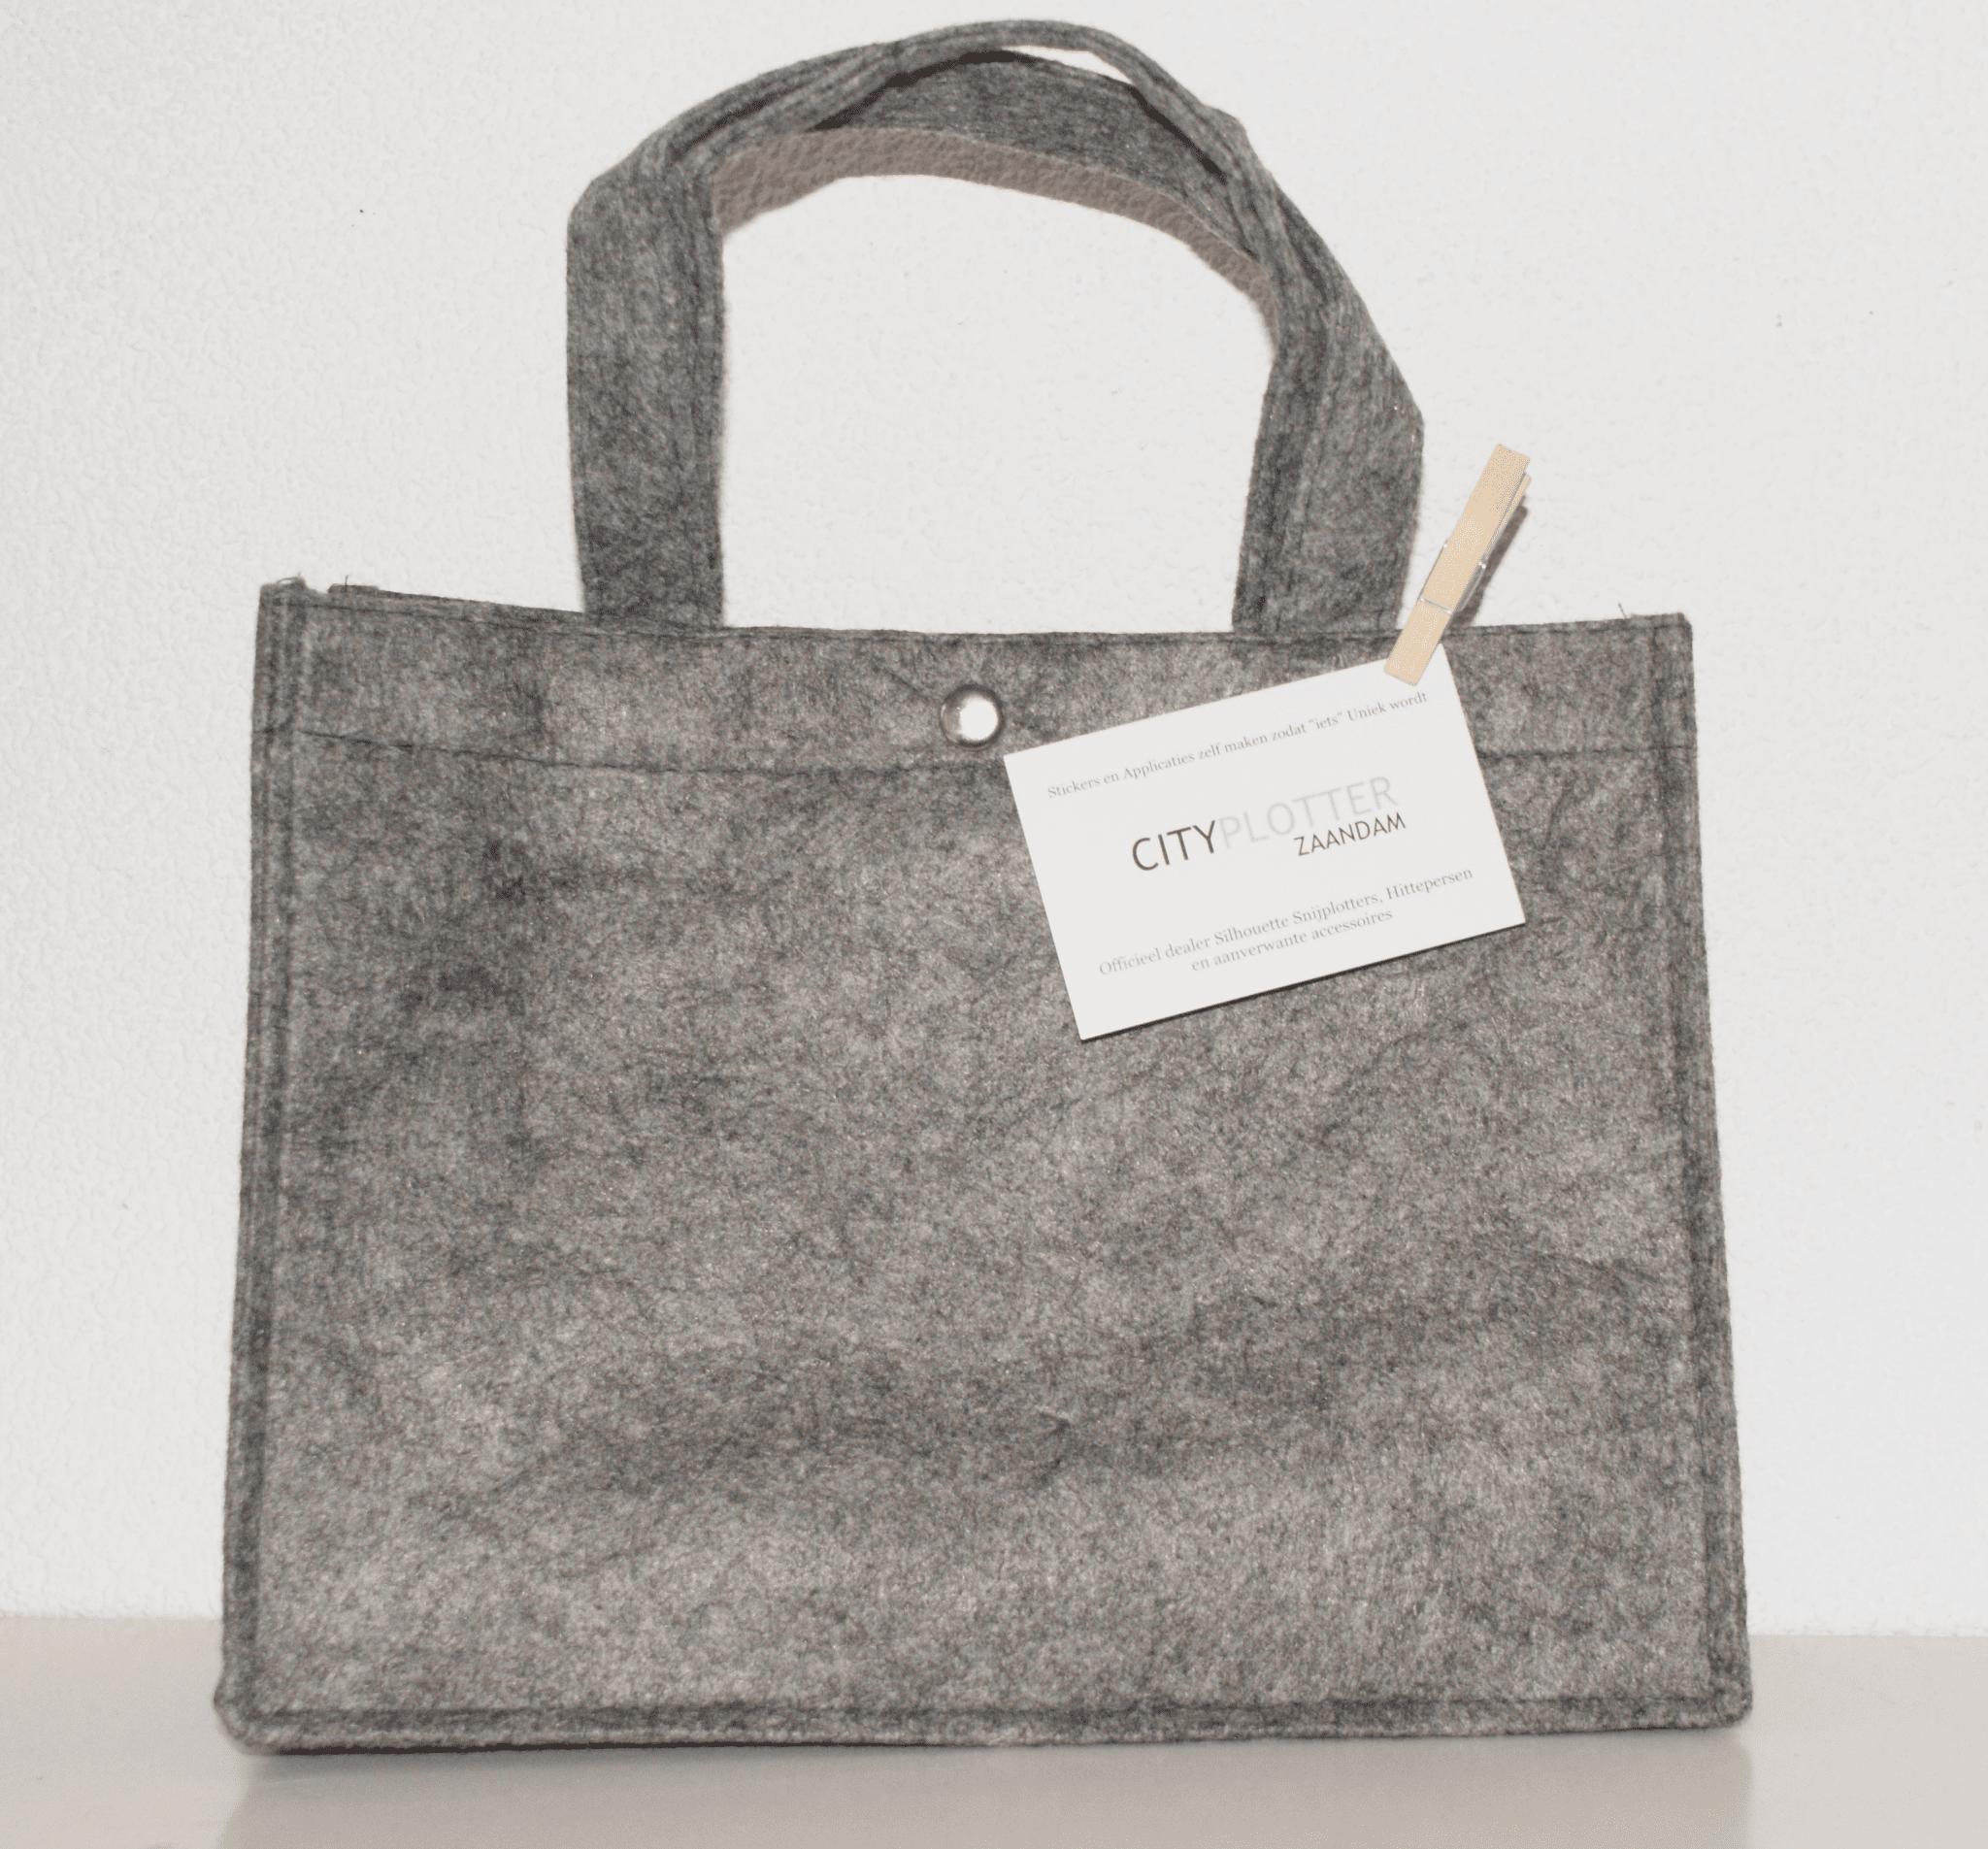 Tas tasjes vilt donker grijs groot met drukknoop bag shopper tassen felt dark grey big Cityplotter Zaandam